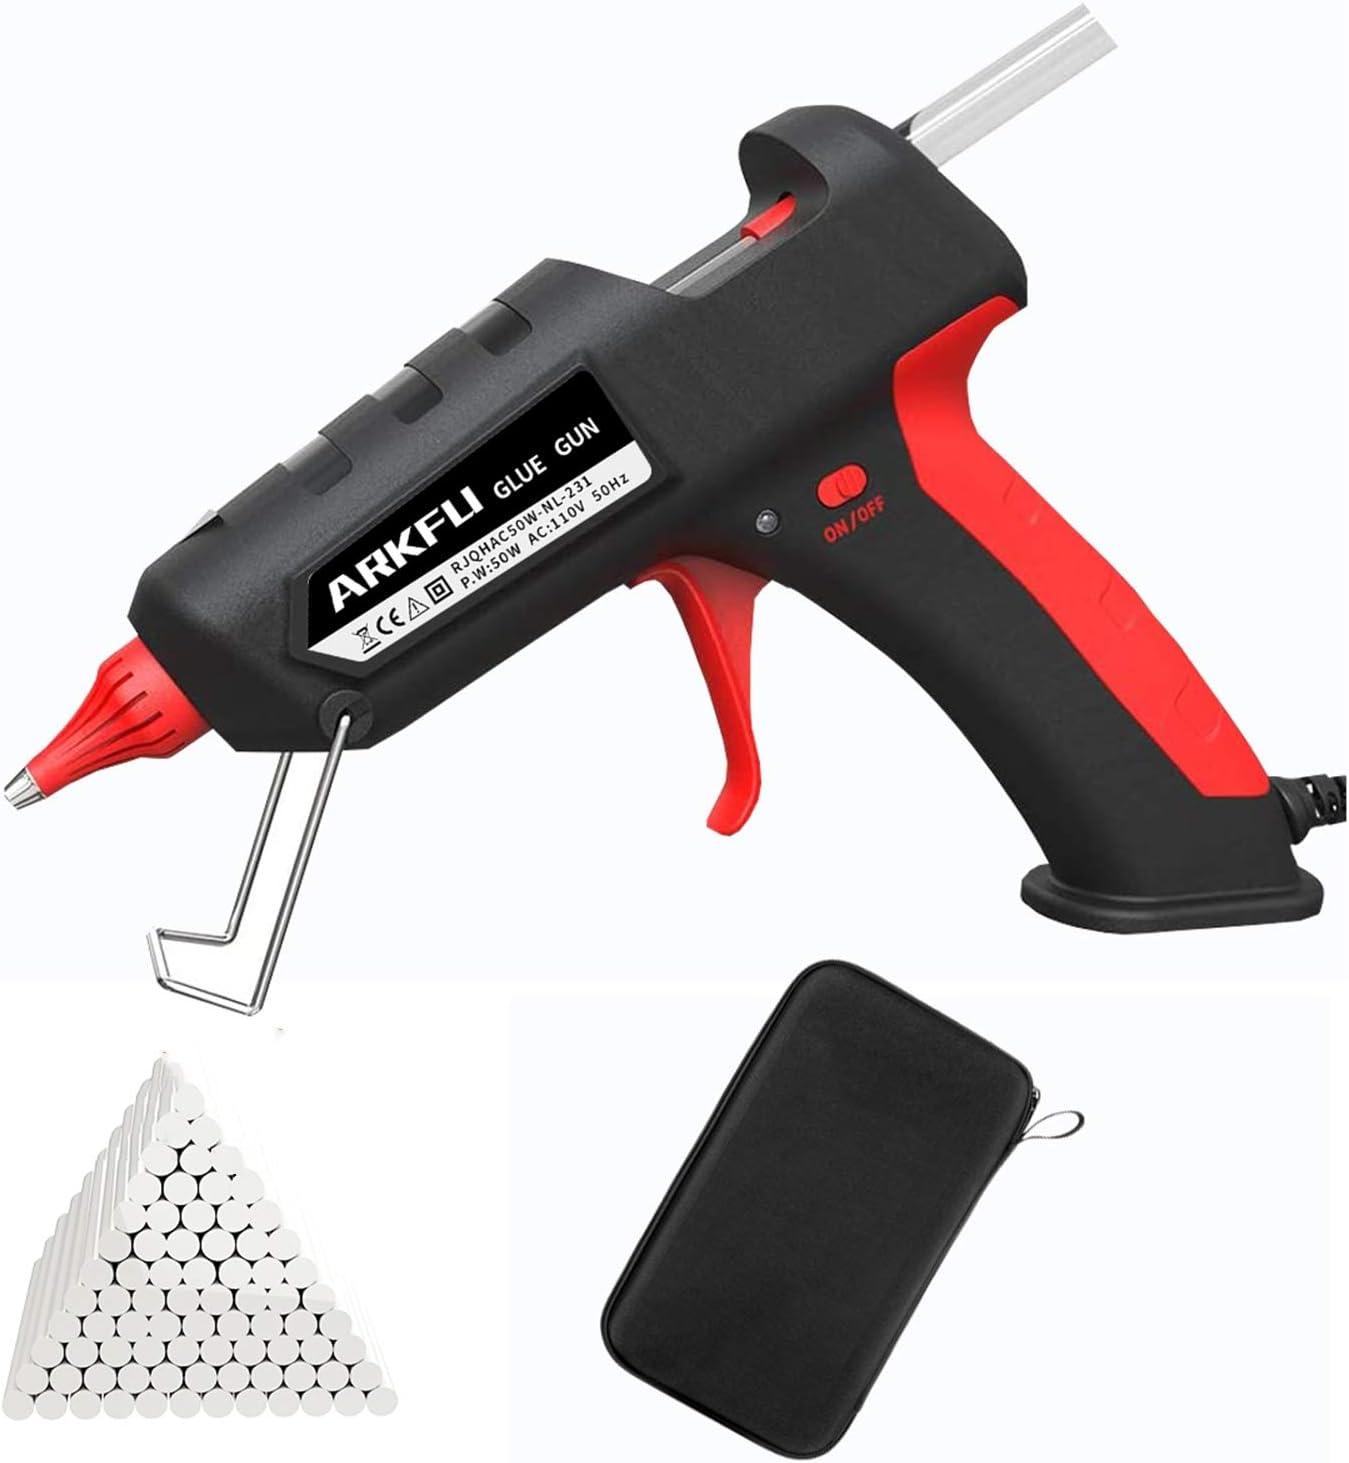 Glue Gun Sets, ARKFU Mini Hot Melt Glue Gun 50w Kit with 30pcs(5.9x0.27 inch) Glue Sticks and Carry Case for DIY, Packaging & Sealing, Arts & Craft, Home Quick Repairs Etc(Black)